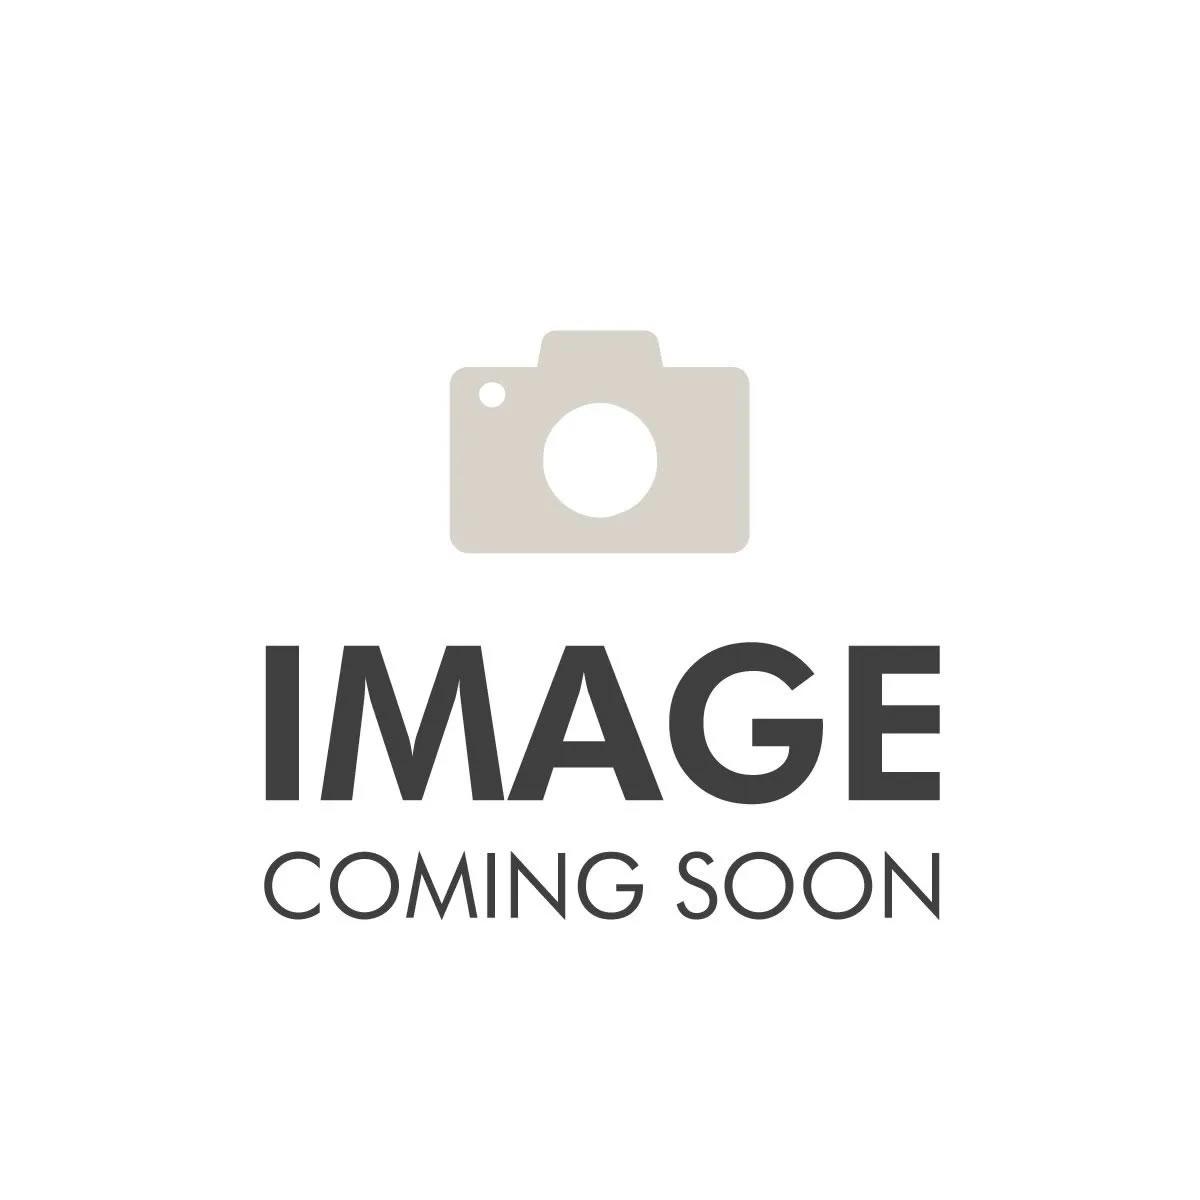 Wiring Harness, w/ Turn Signal; 45- early 46 Willys CJ2A